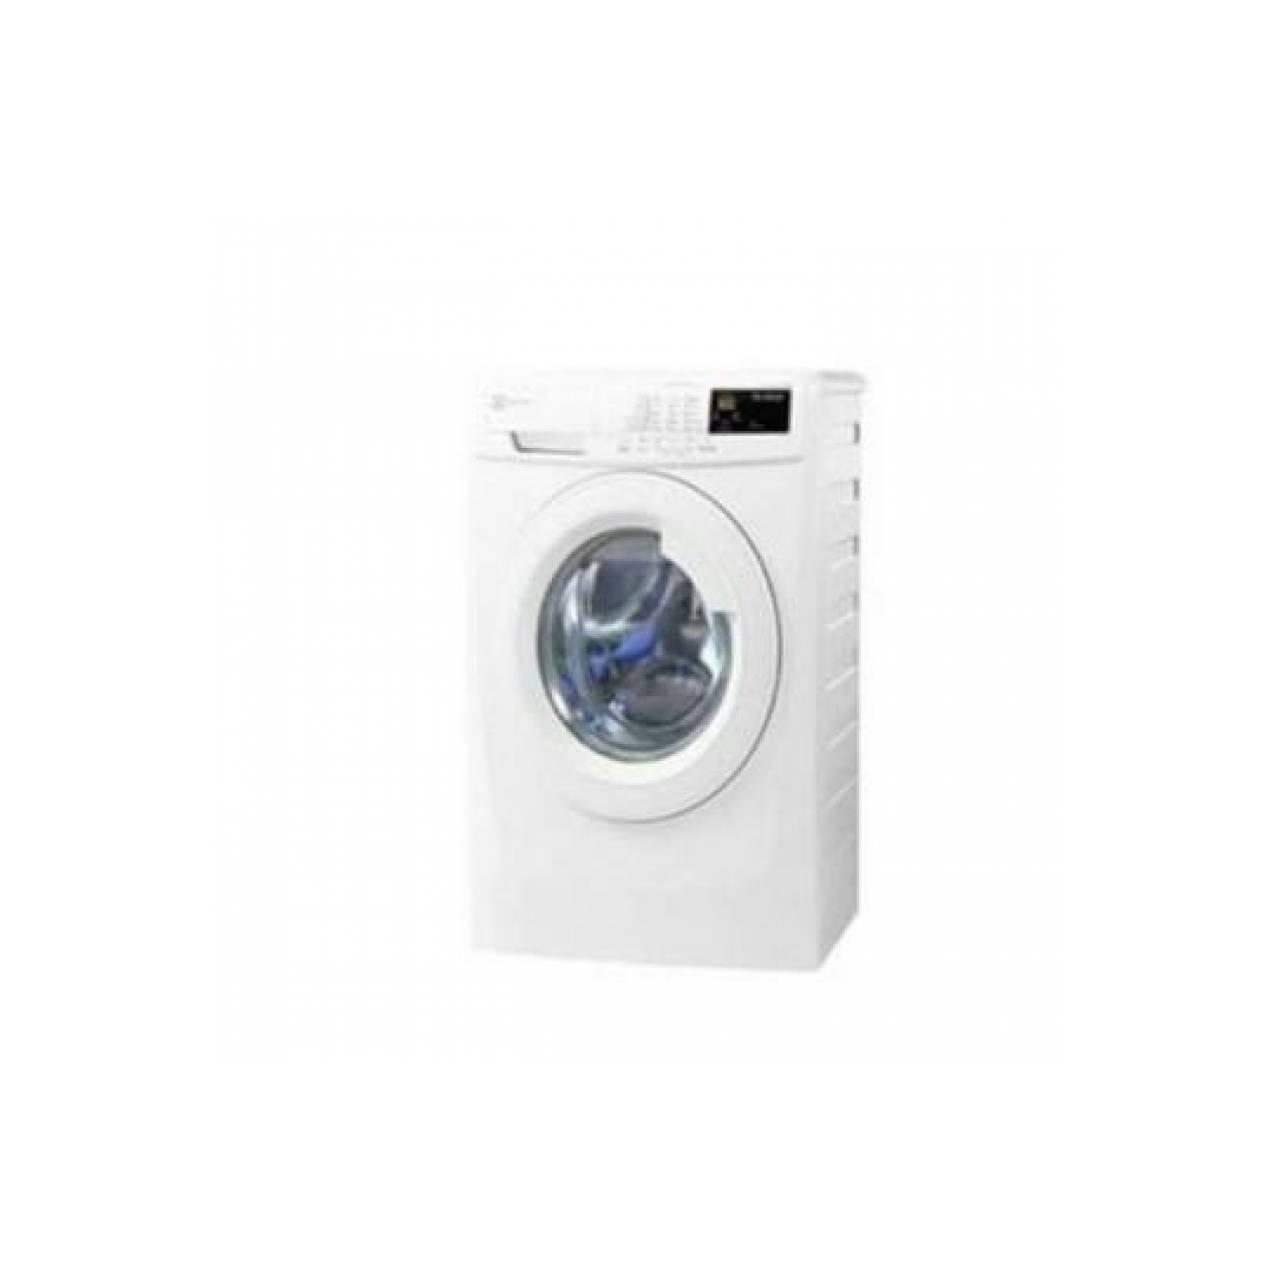 Electrolux Washer EWF-85743 Mesin Cuci Front Loading [7,5kg]